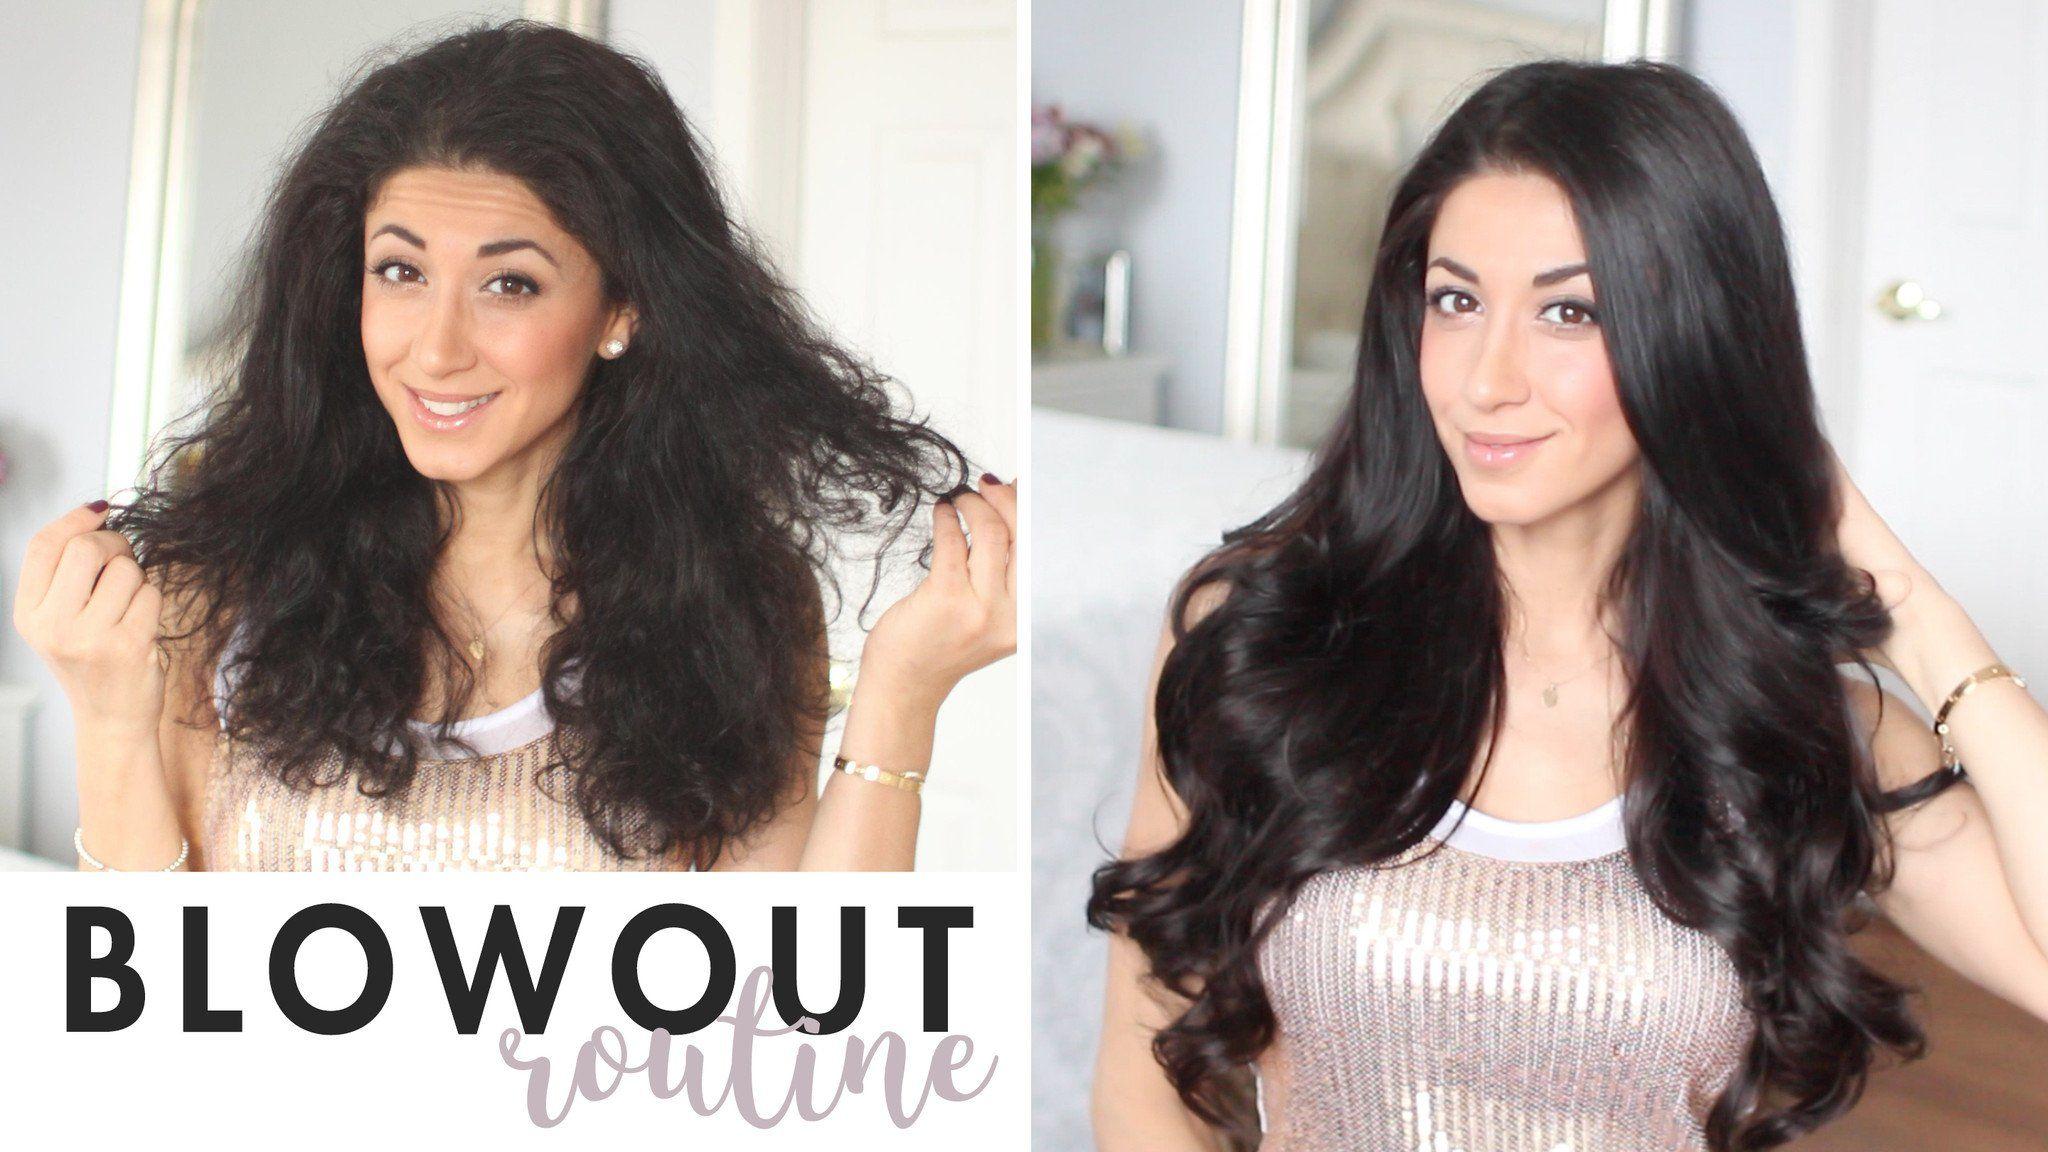 Ongebruikt 5 Ways to Curl Your Hair | Clip in hair extensions, Hair RX-53